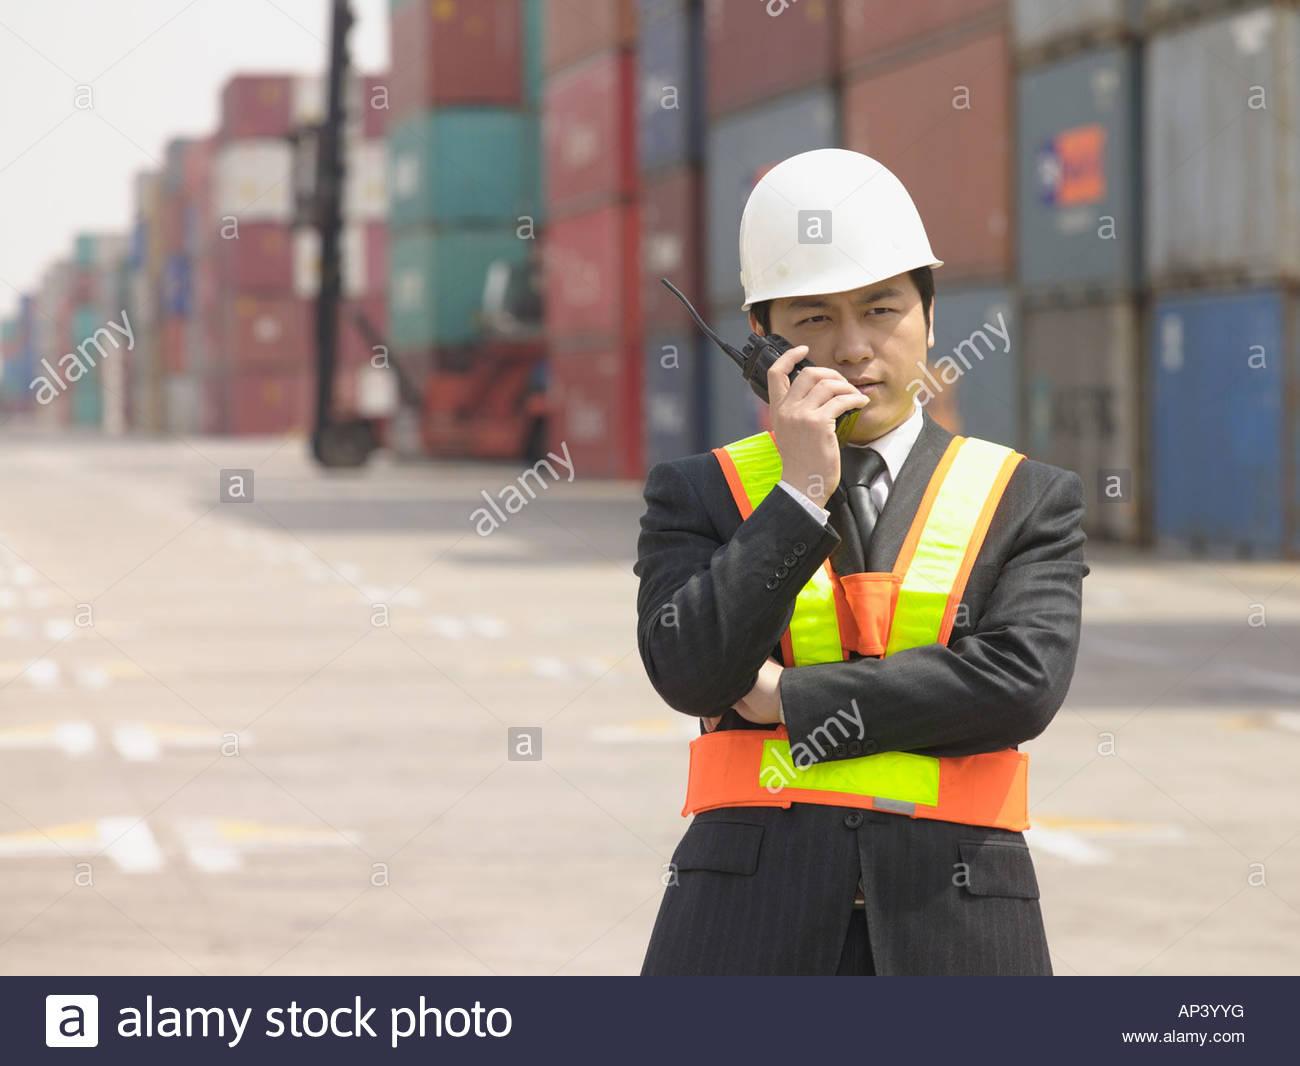 Man with walkie talkie - Stock Image